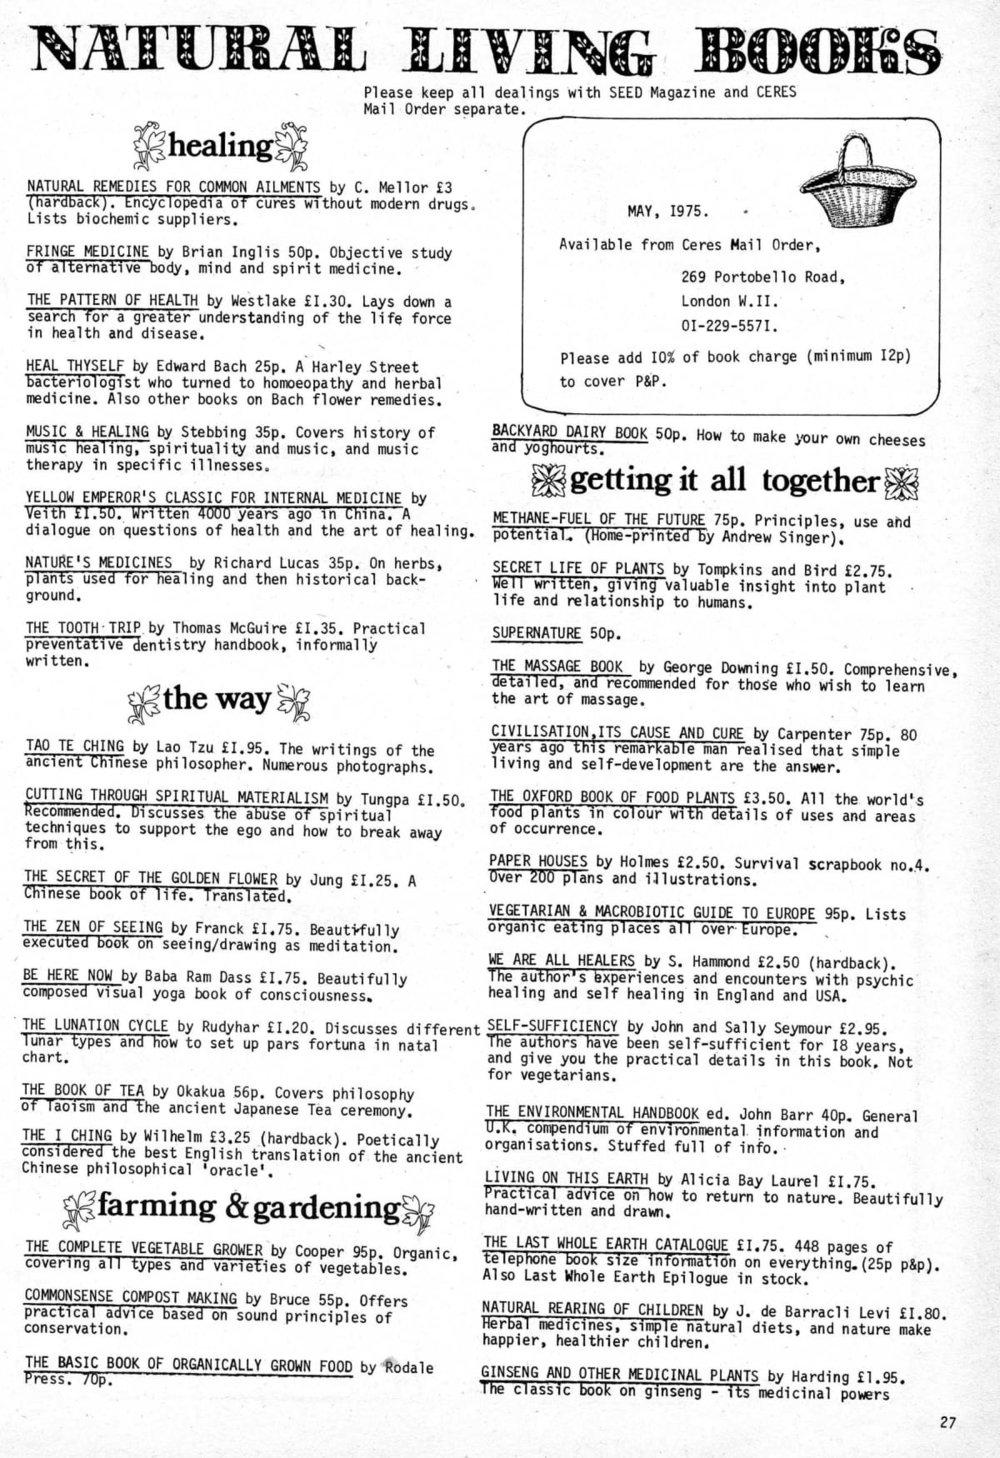 seed-v4-n5-may1975-27.jpg